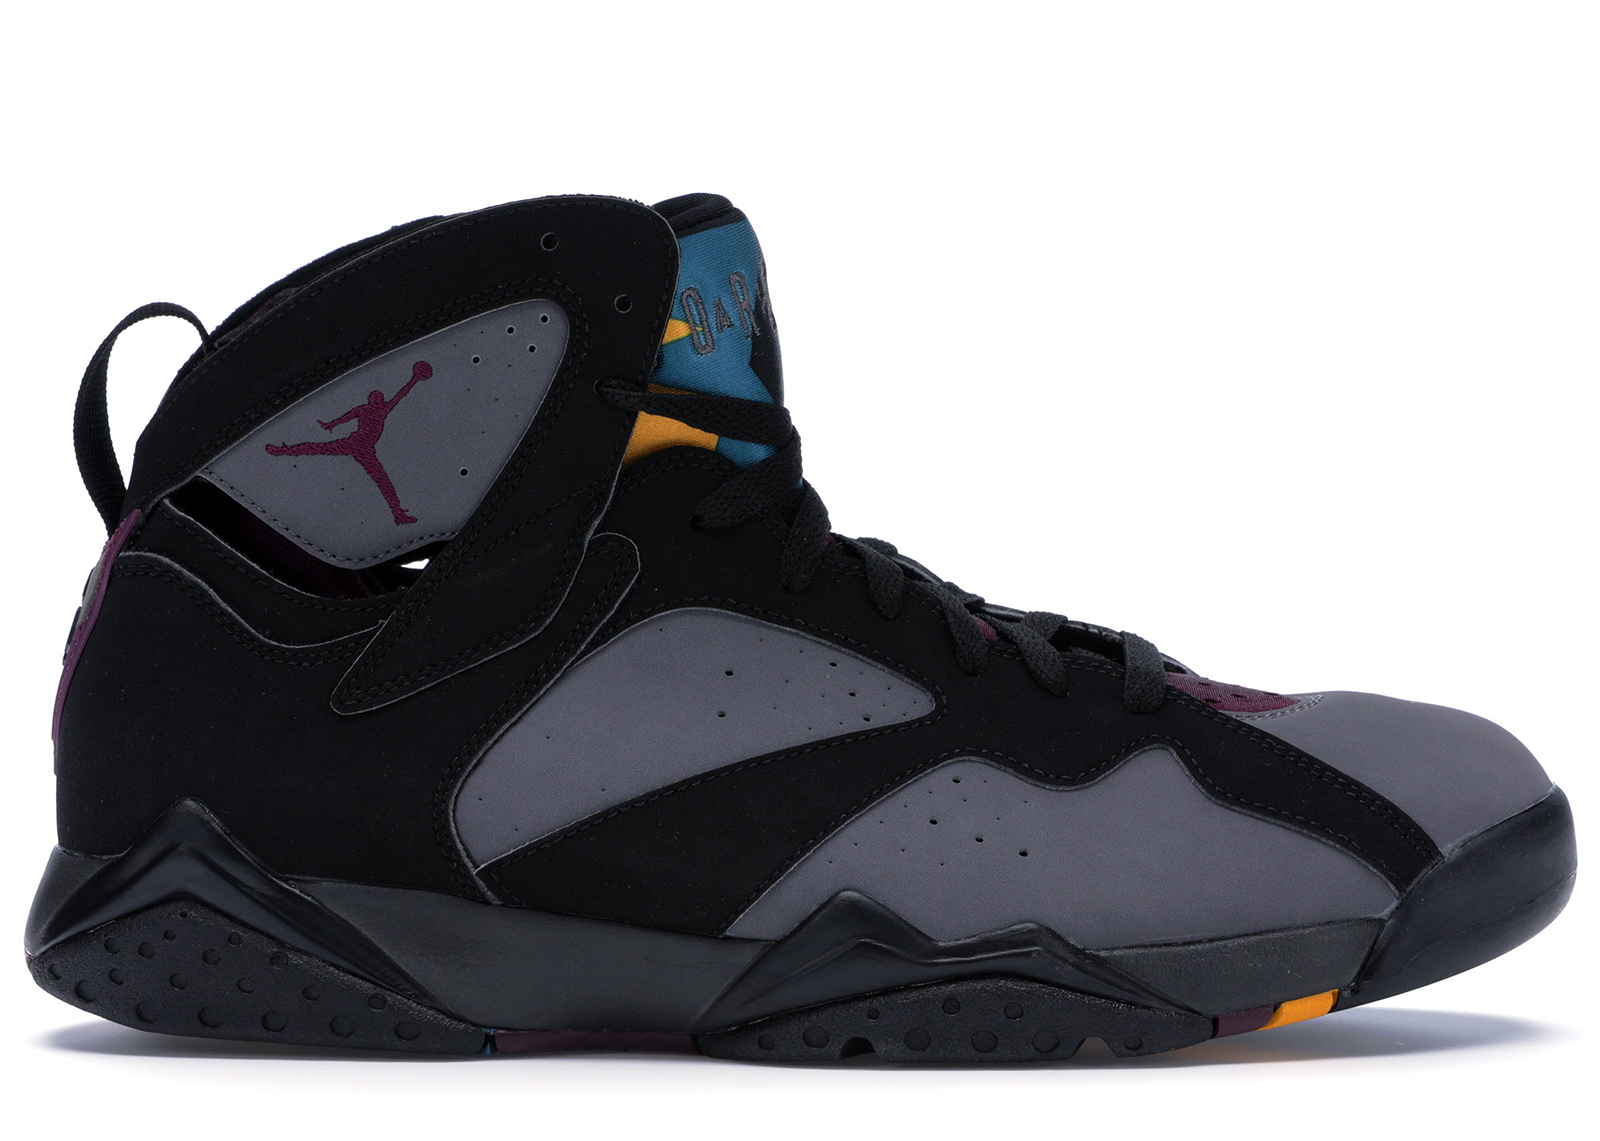 Jordan 7 Retro Bordeaux (2015) - 304775-034